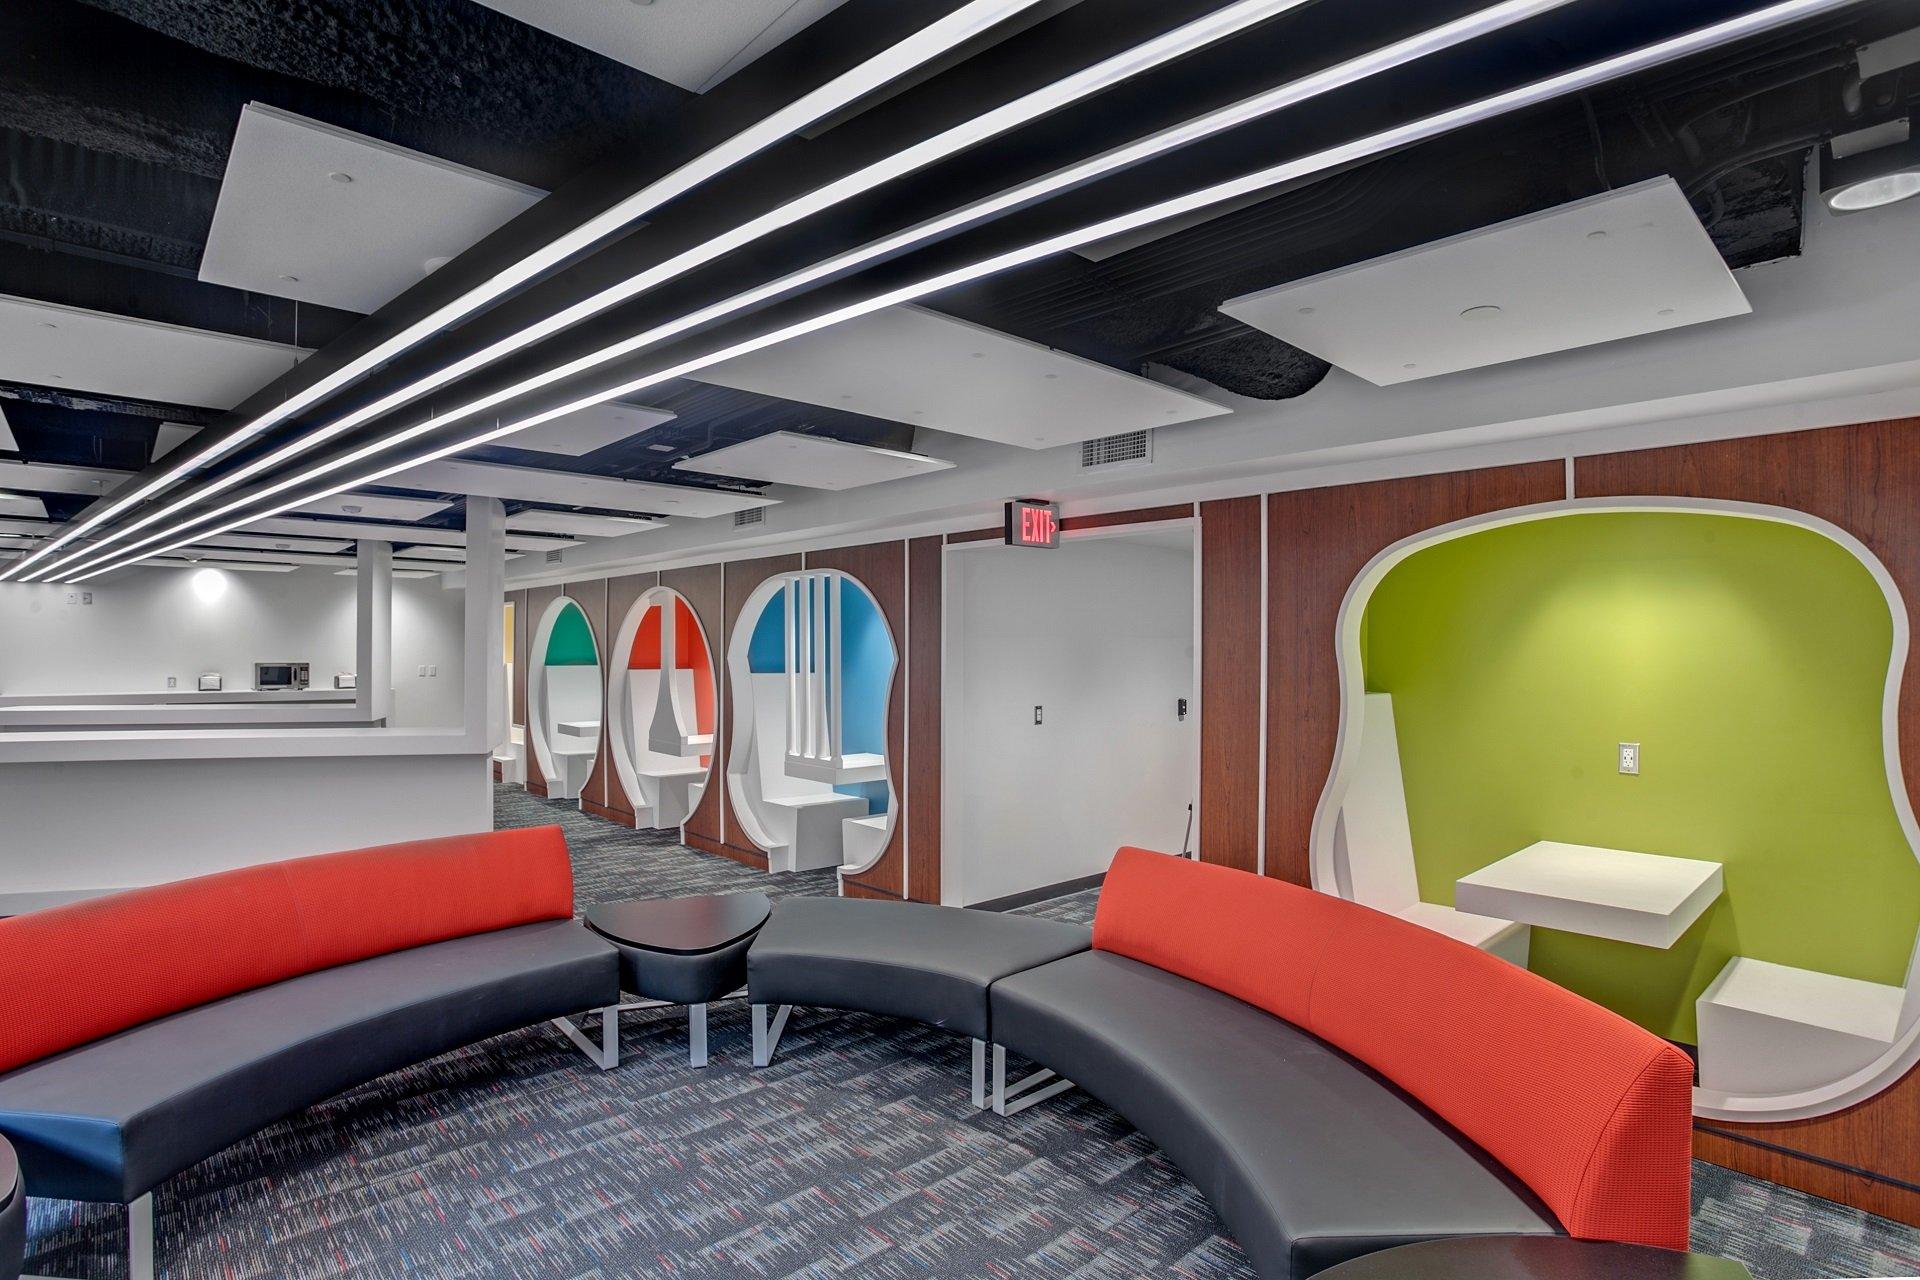 grand rapids community college music center interphase interiors. Black Bedroom Furniture Sets. Home Design Ideas